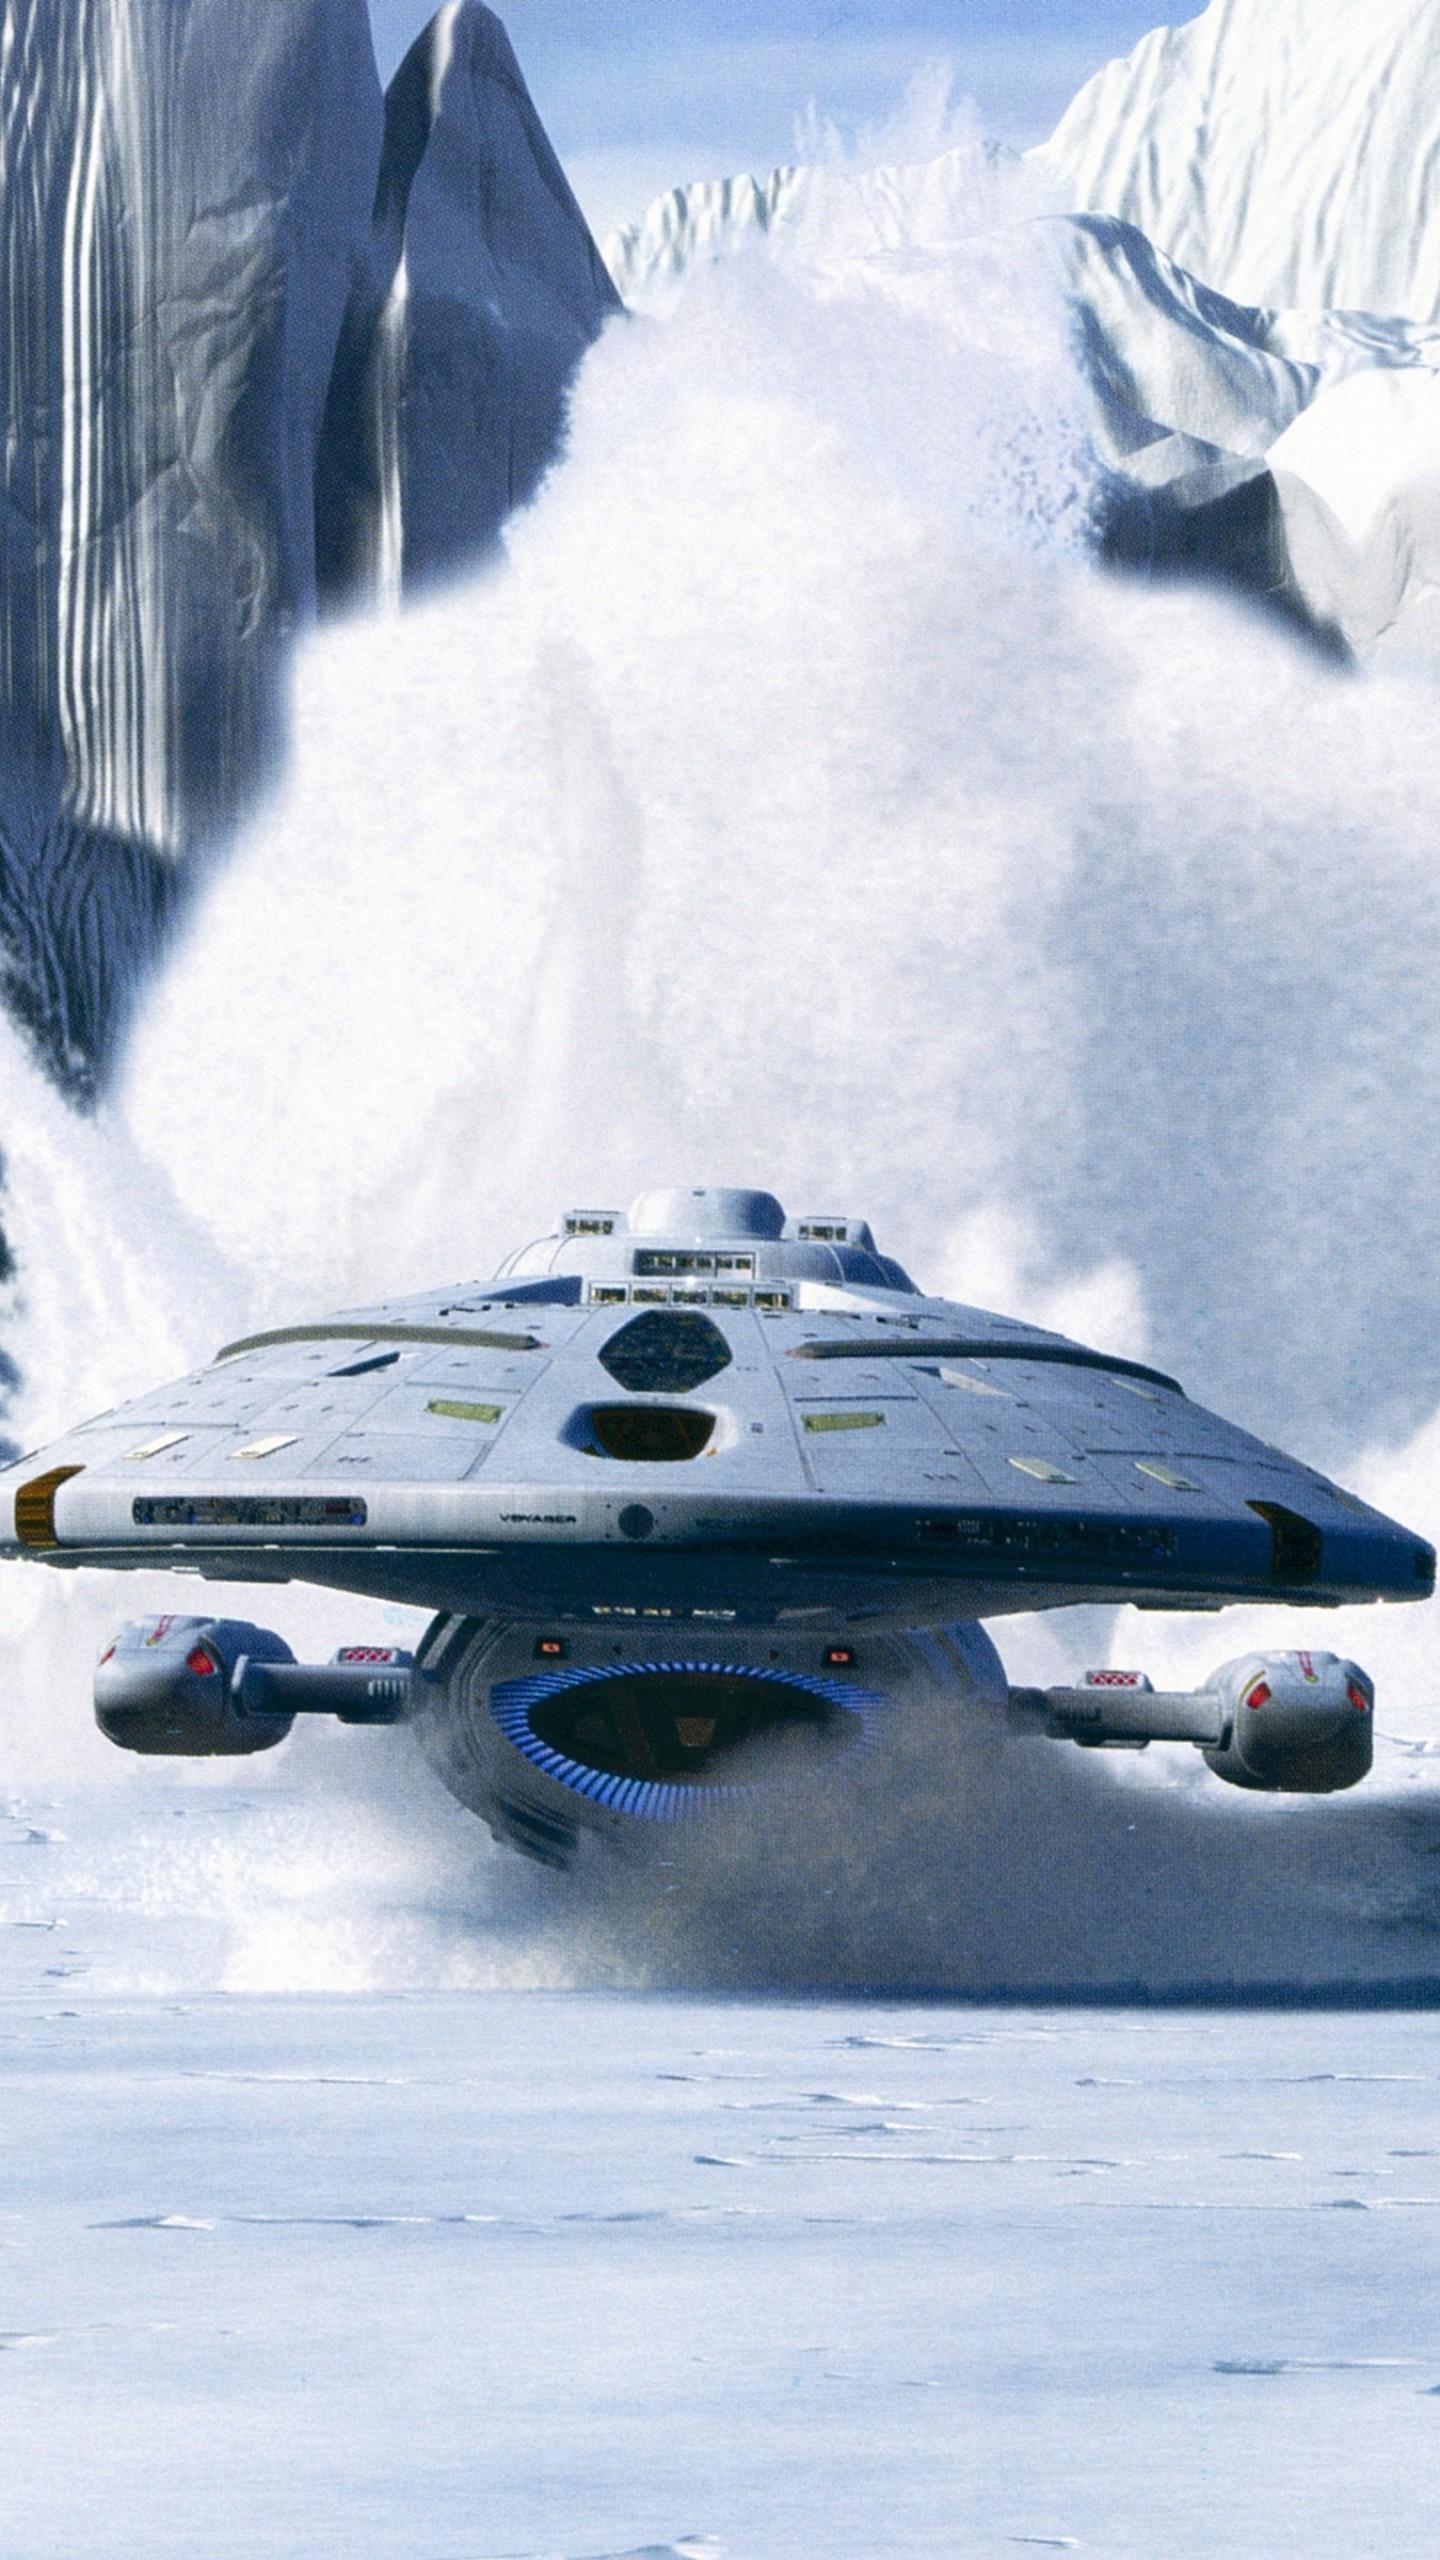 عکس زمینه سفینه فضایی در میان برف پس زمینه